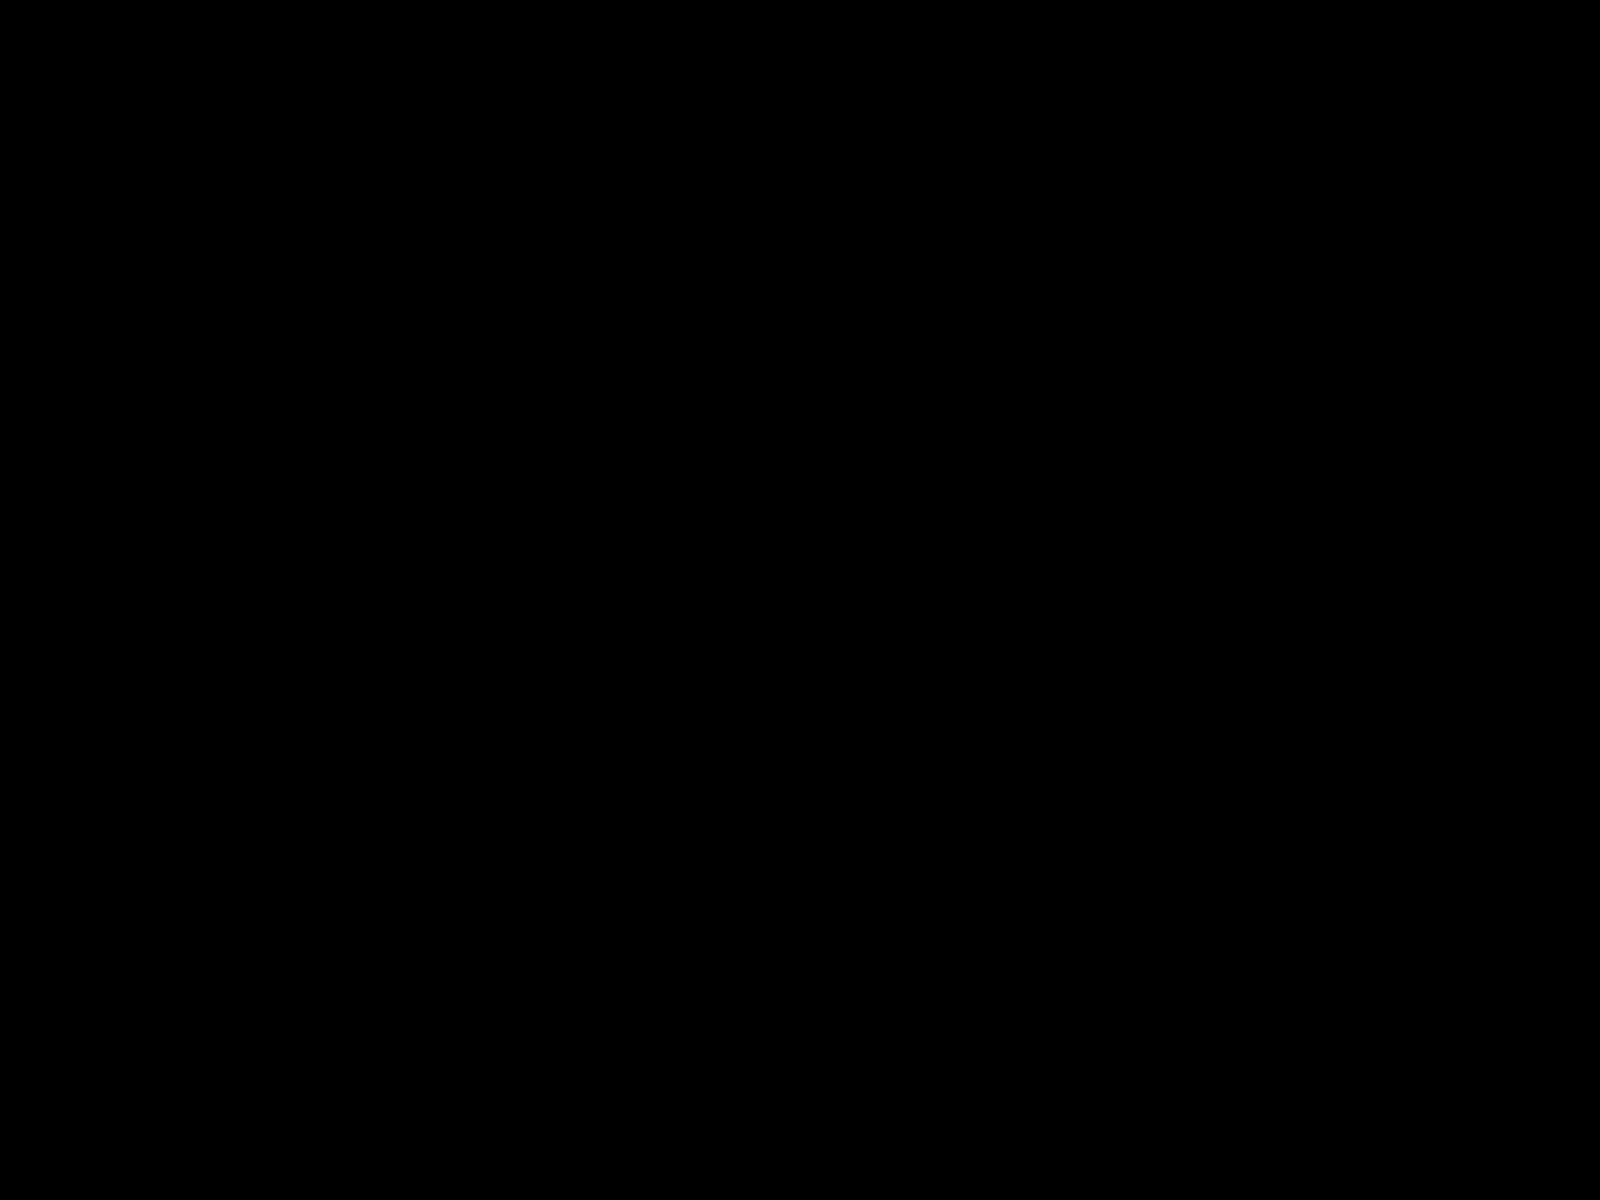 Cosplay 'Boob Plate' Pattern